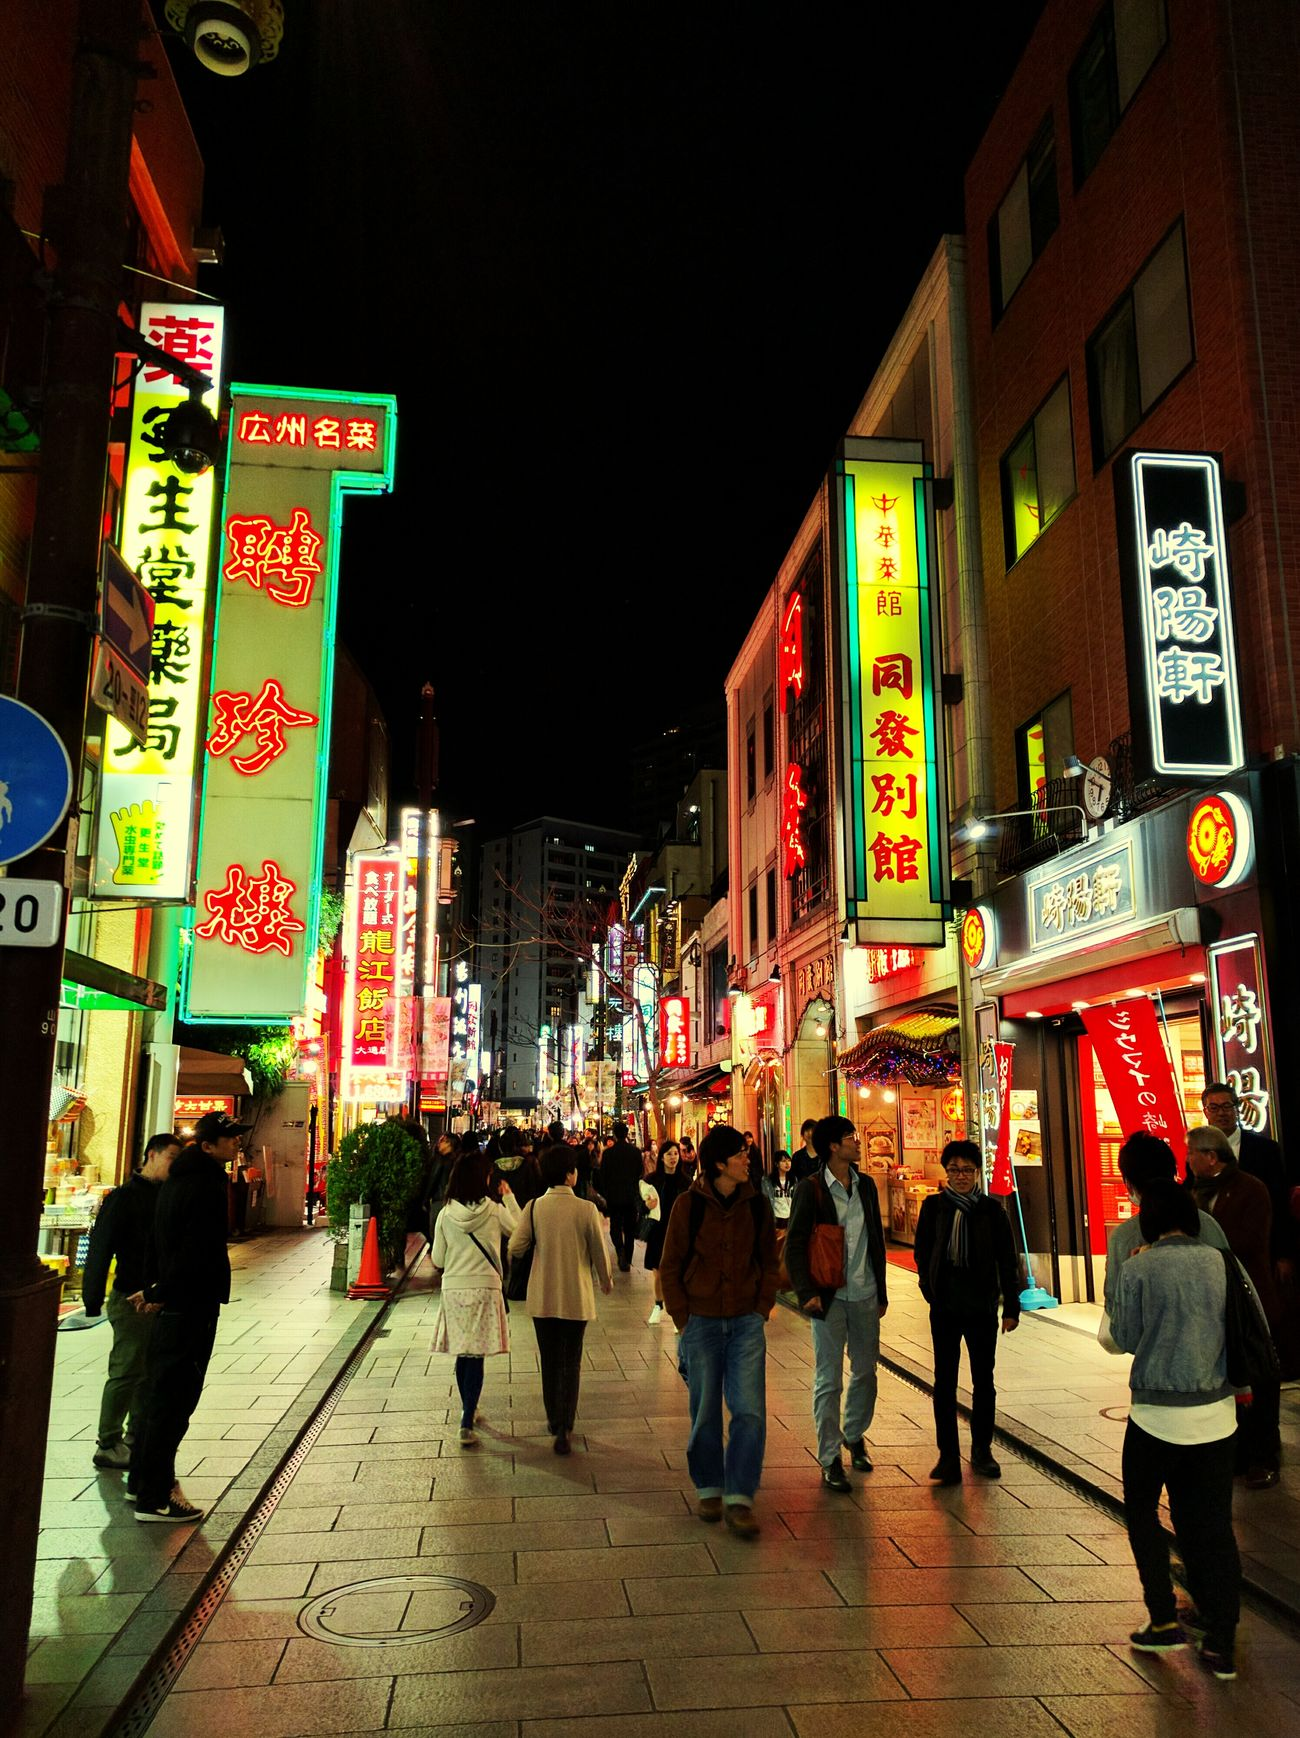 Chinatown in Japan Chinatown Japan Travel Itsmorefuninthephilippineswithnathan